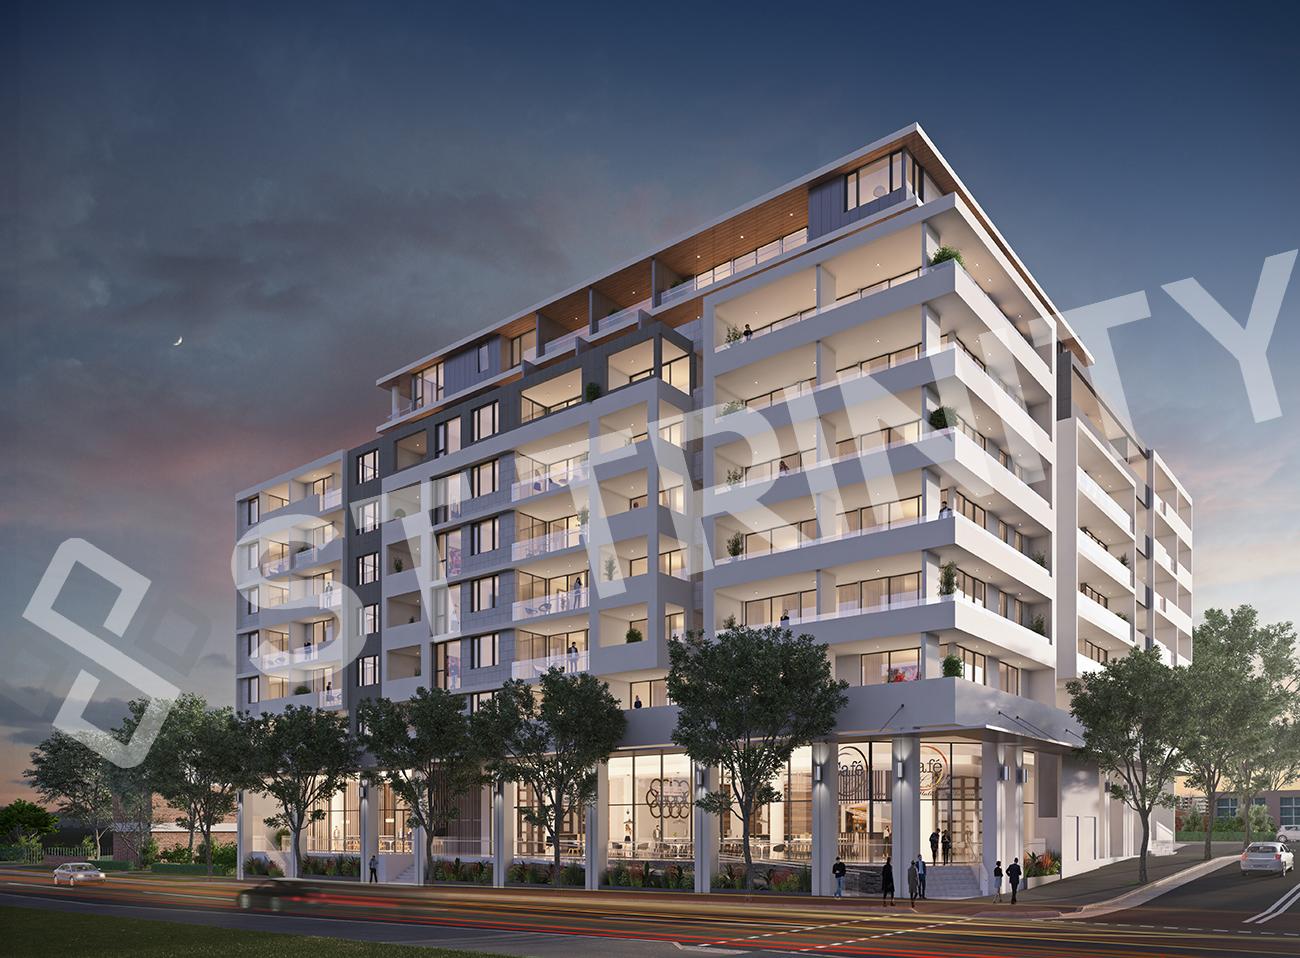 804/14 Auburn Street, Wollongong NSW 2500, Image 0